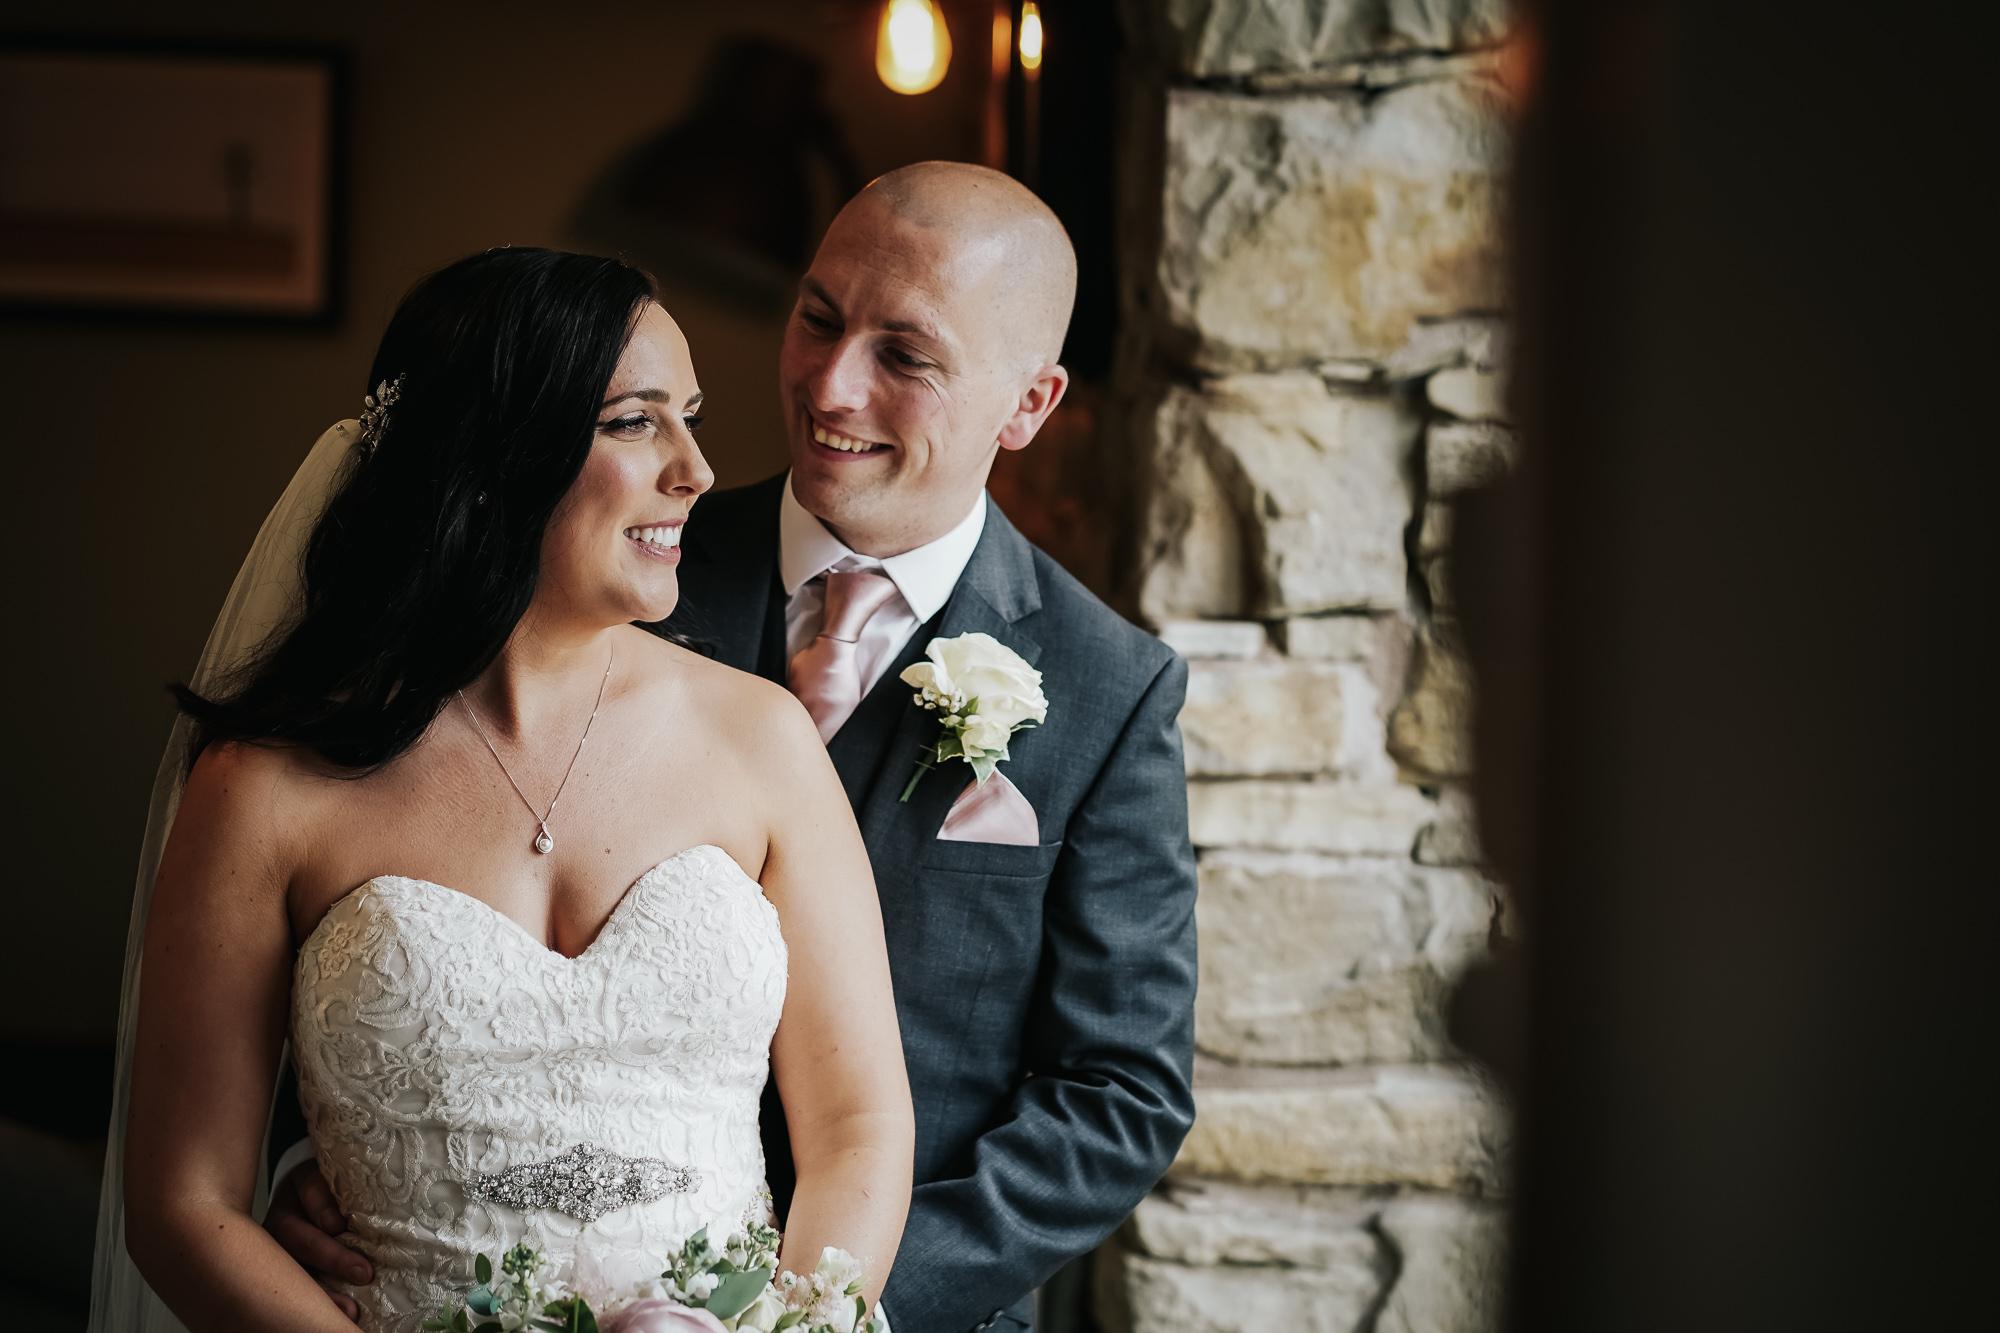 Hyde Bank Farm Wedding Photography Manchester wedding photographer (35 of 49).jpg